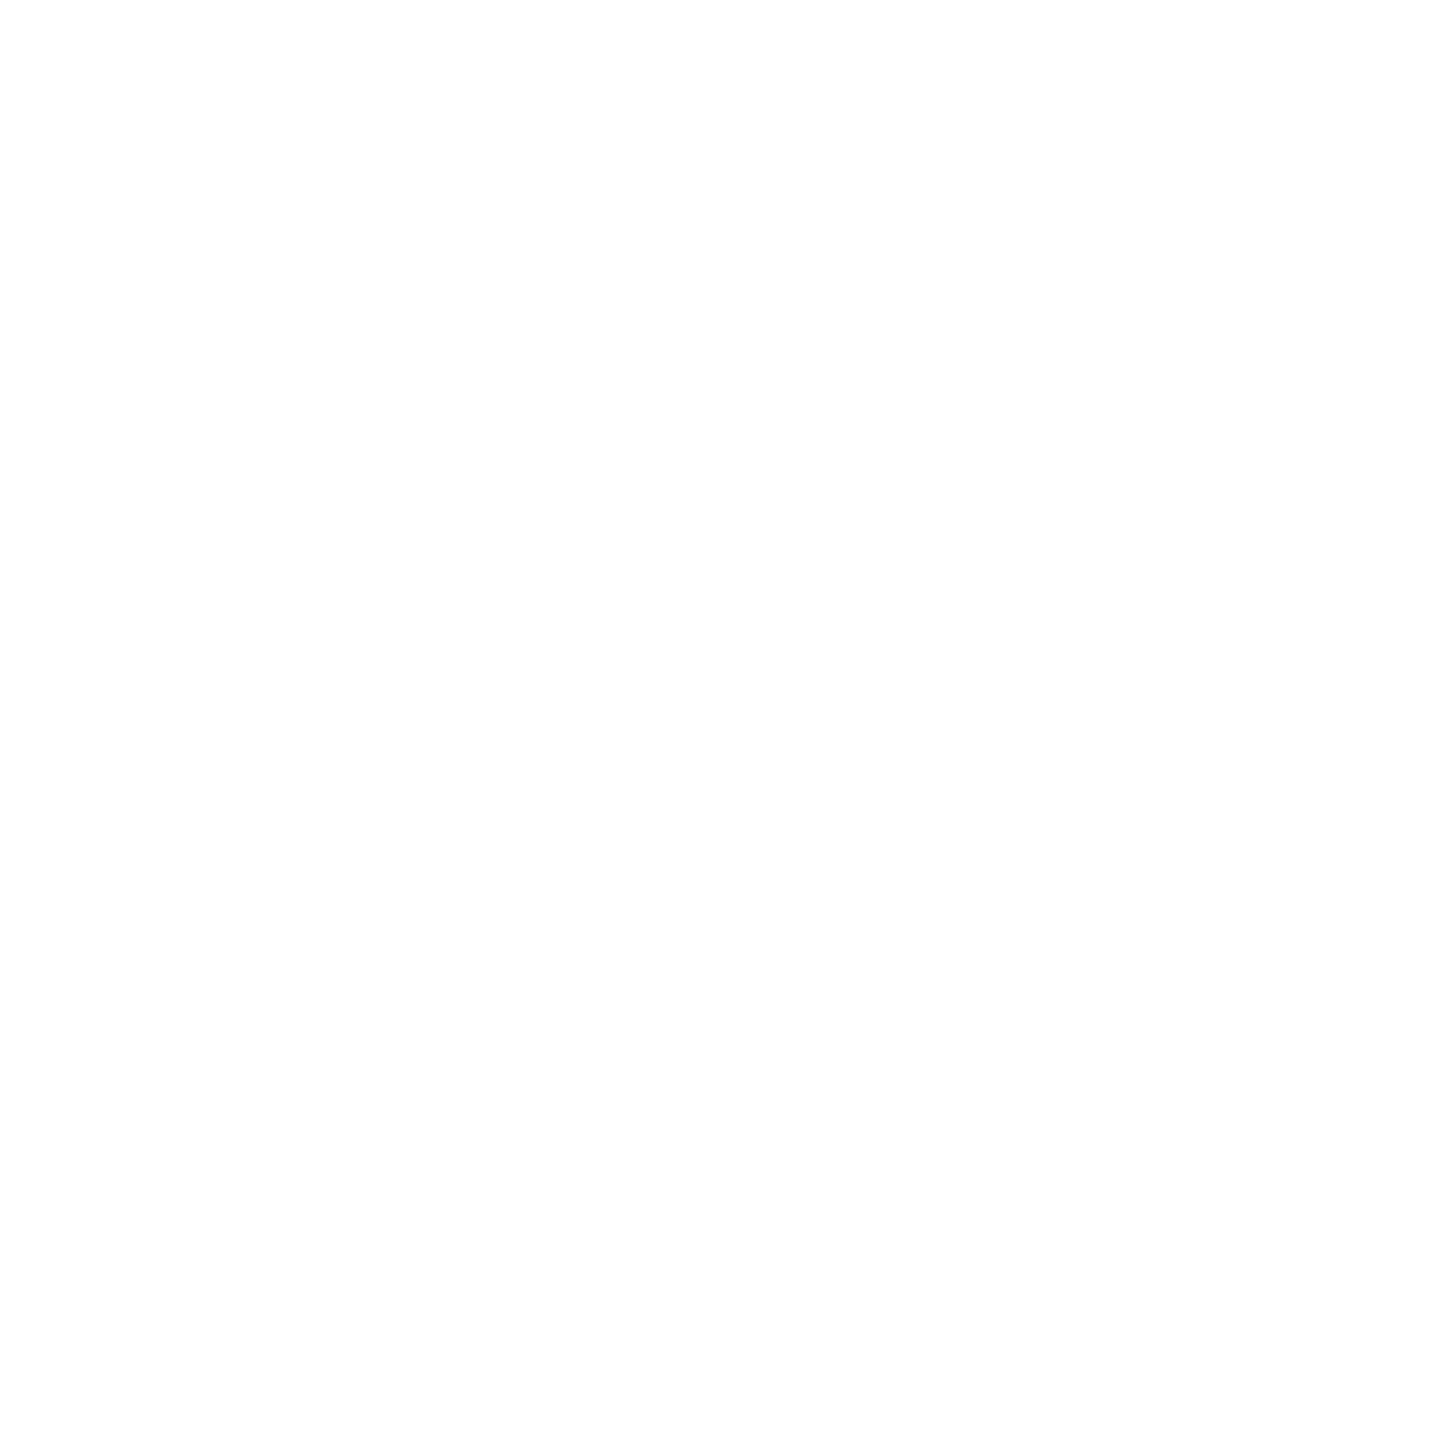 thumb_carbon_neutral-logo-sandenvendo_1614442525.png